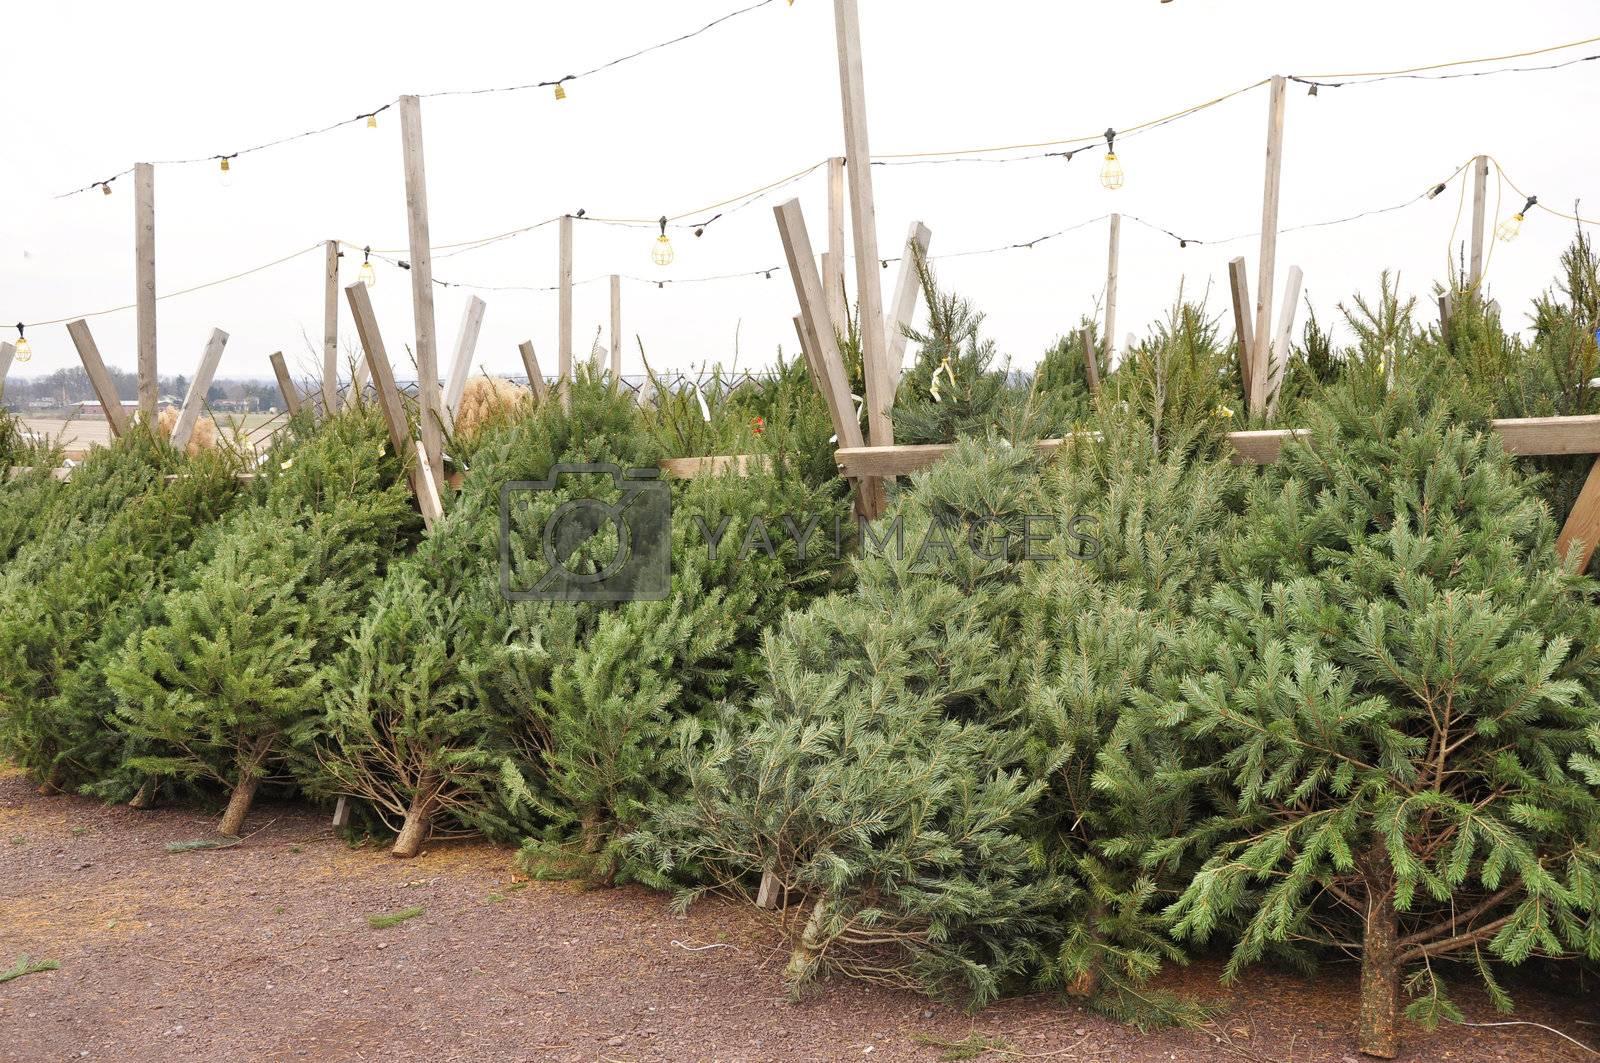 row of cut evergreen trees ready for the holiday season